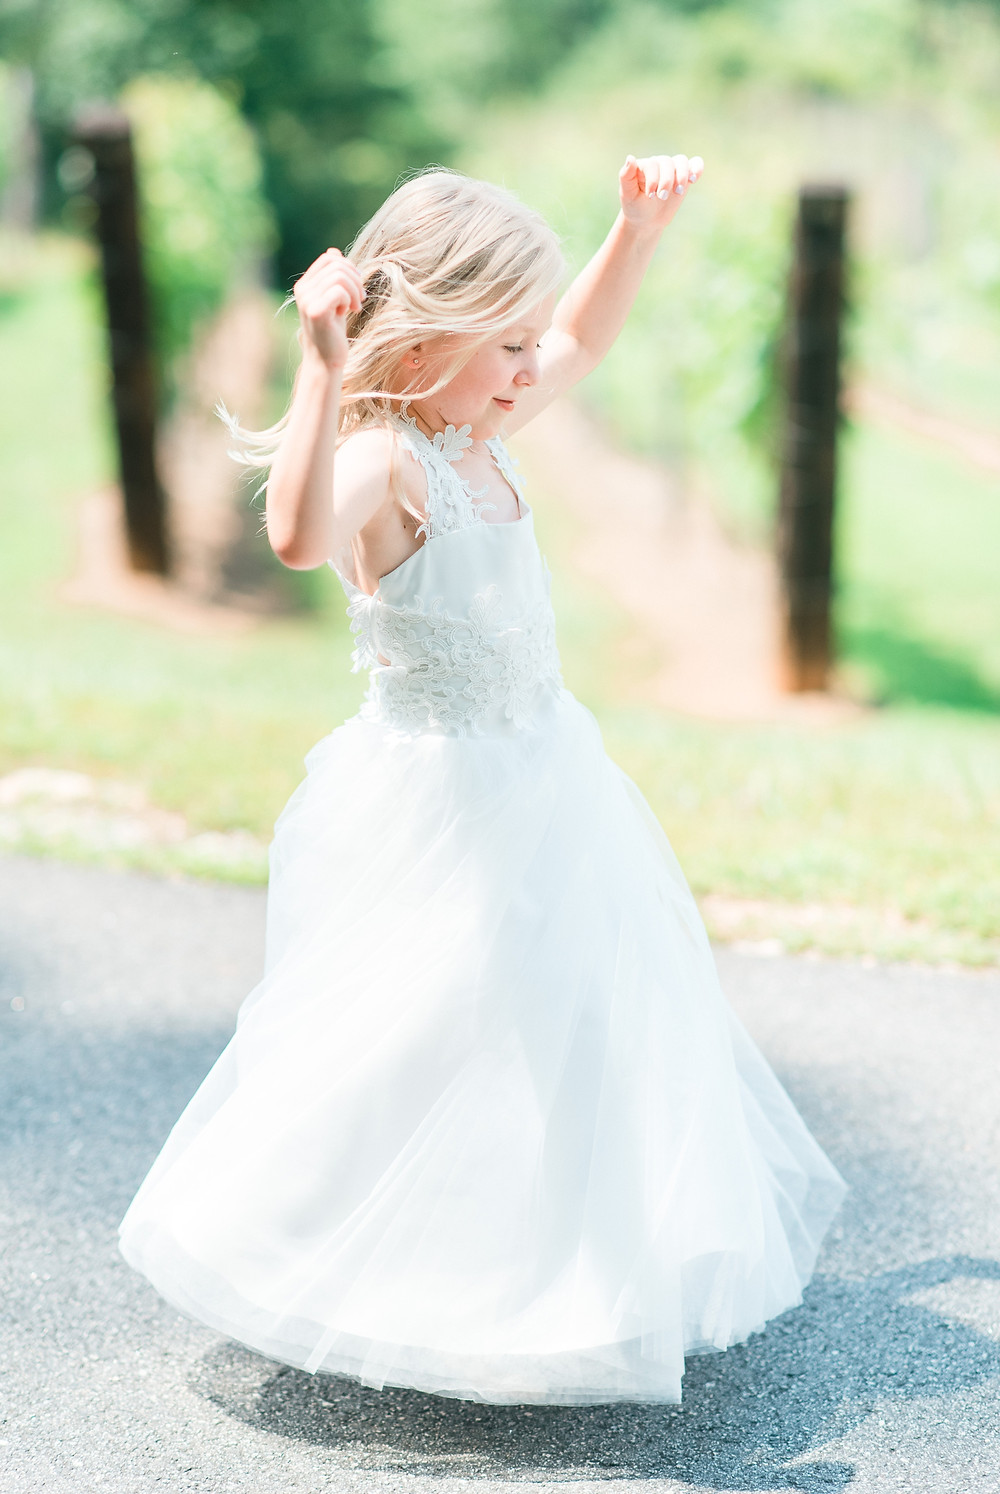 blue-mountain-vineyard-wedding-venue-outdoor-wedding-ceremony-pastel-wedding-color-palette-beautiful-flower-girl-dress-flower-girl-dancing